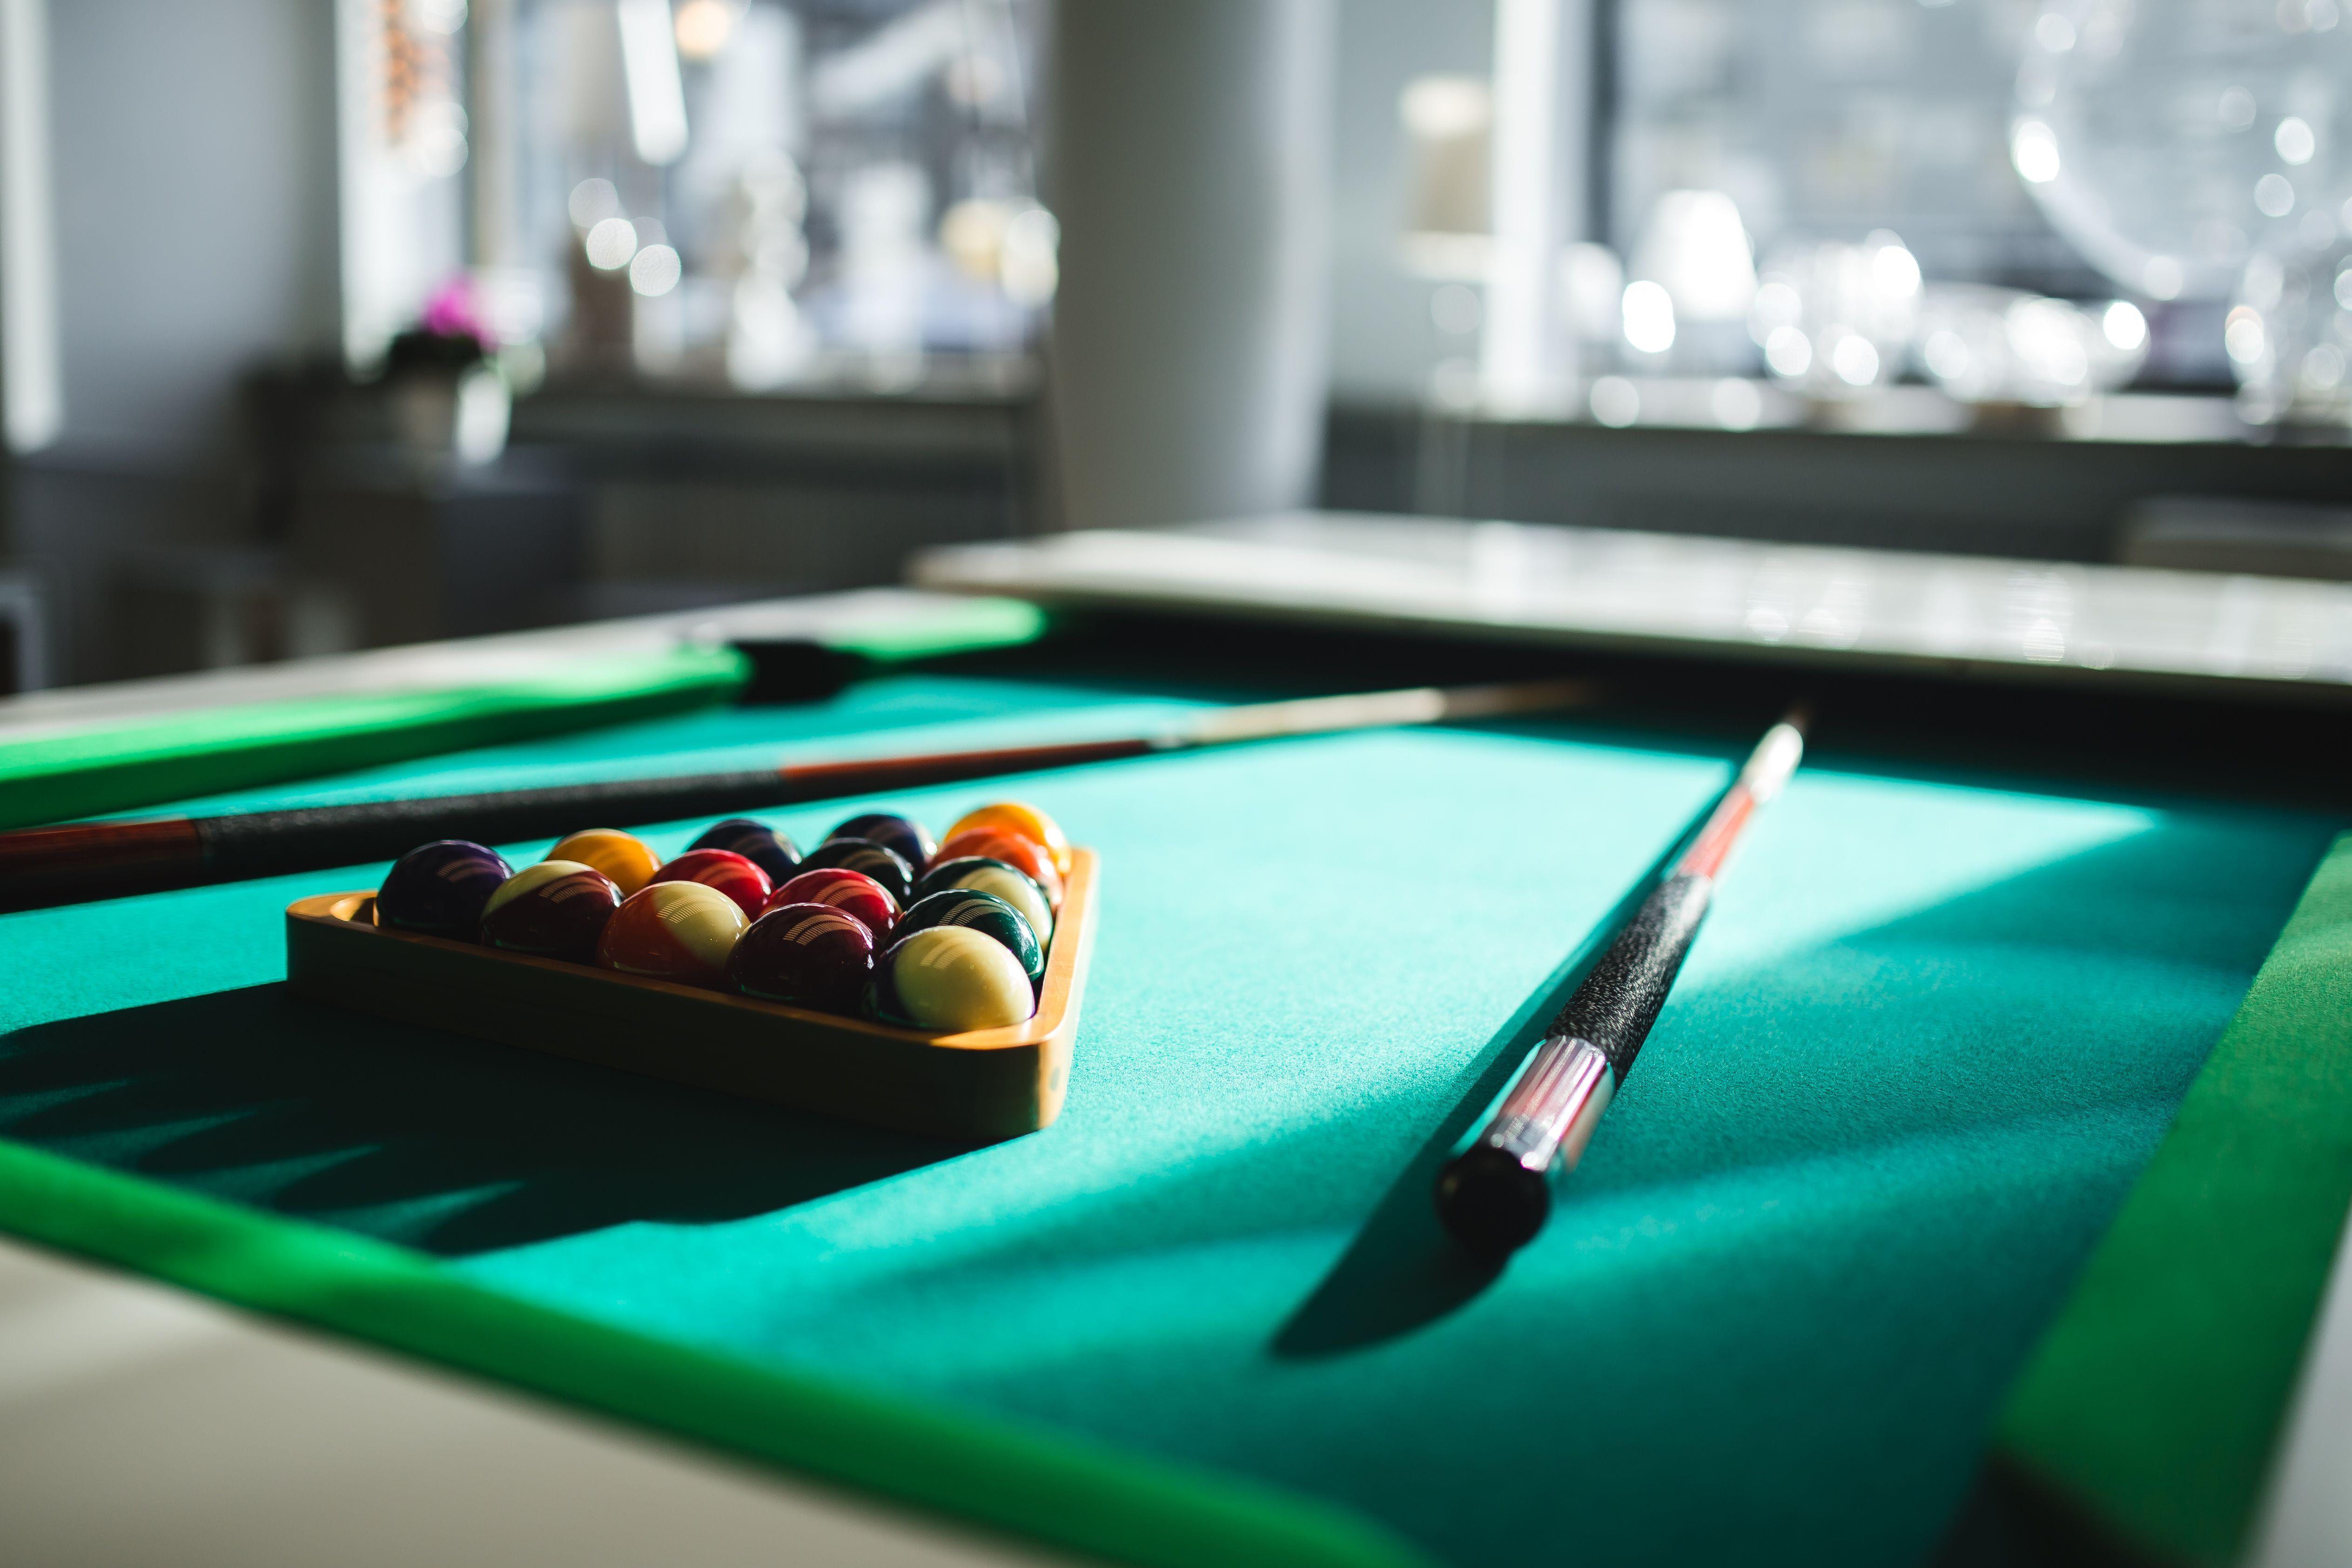 Billiard balls on green table with billiard cue Billiard